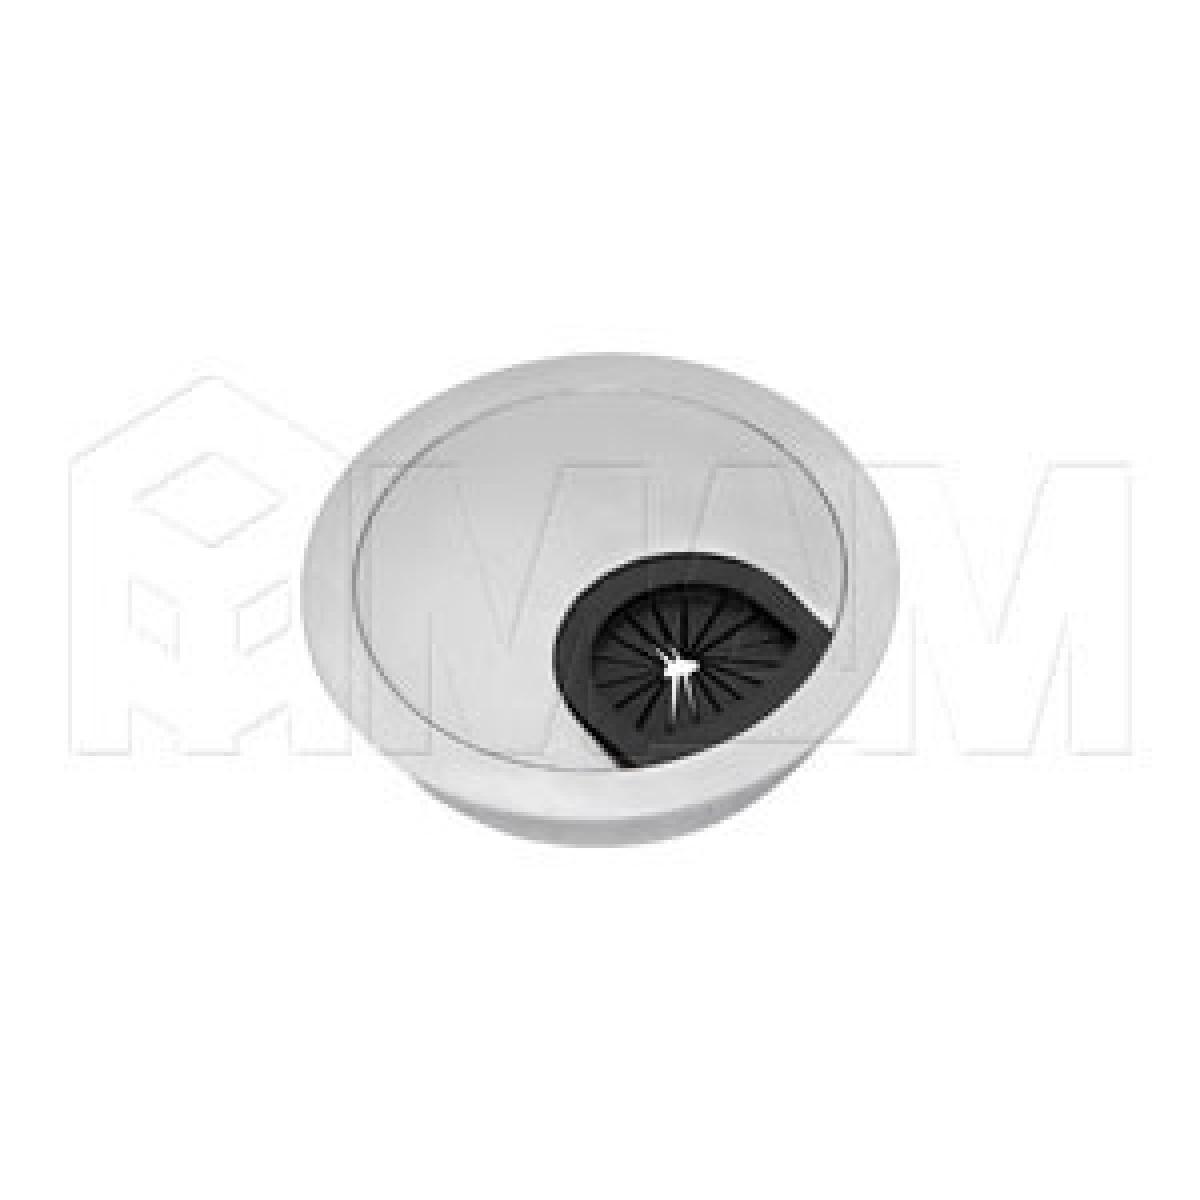 Заглушка кабель-канала, металлическая, круглая, d=60 мм, хром матовый